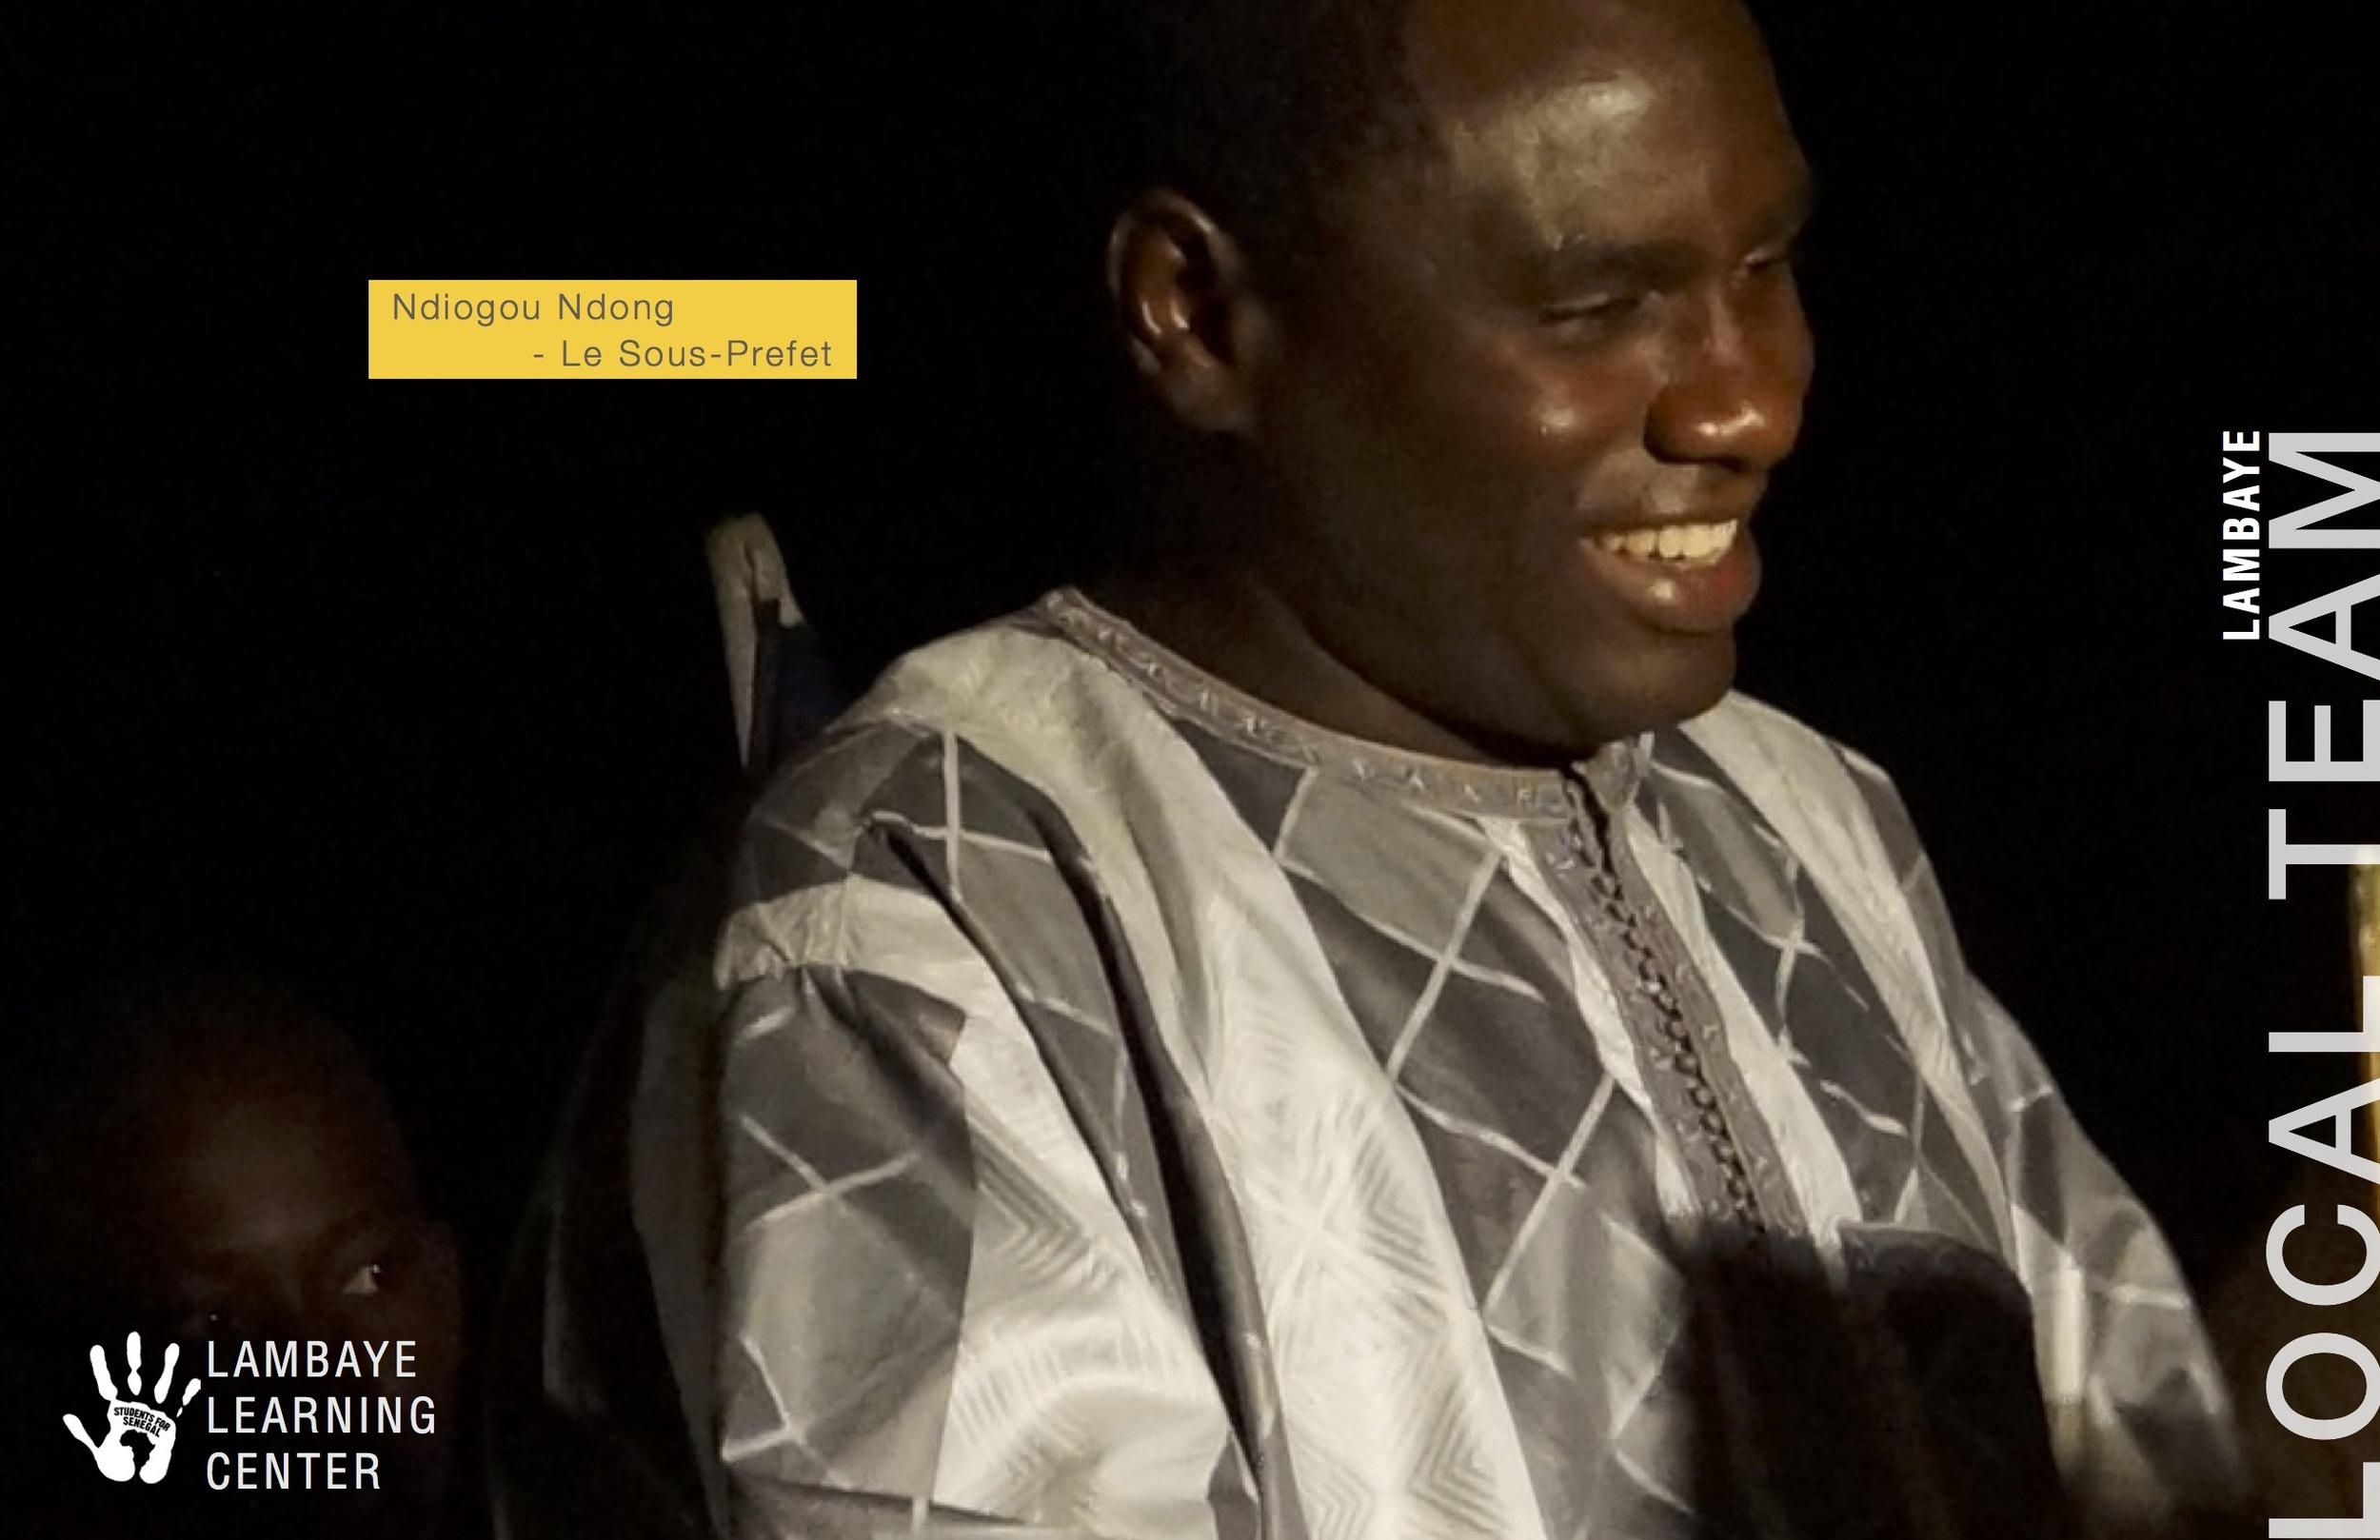 Nidogou Ndong - Le Sous Prefet (village administrator)